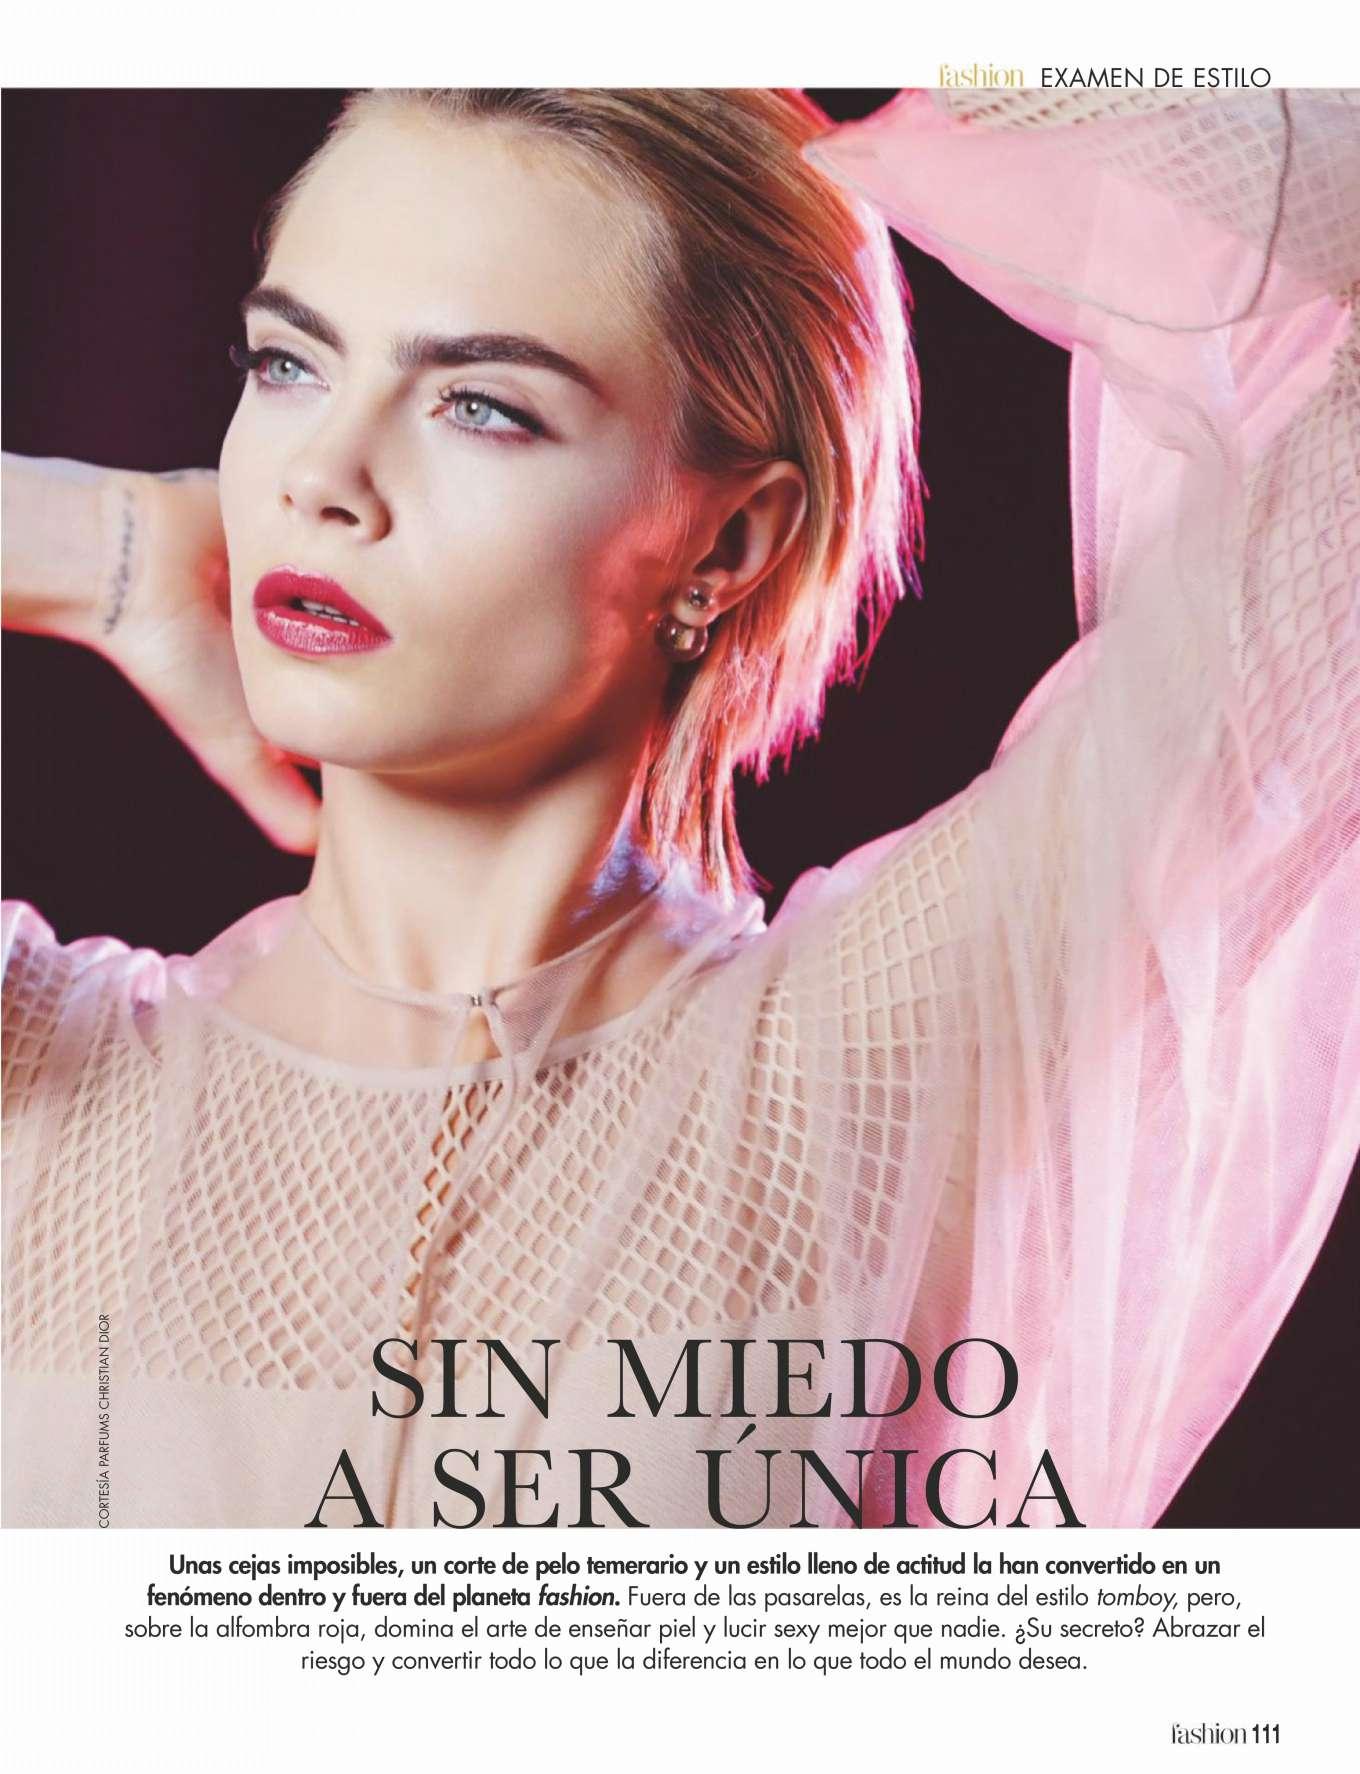 Cara Delevingne 2019 : Cara Delevingne: ¡Hola! Fashion 2019 -02